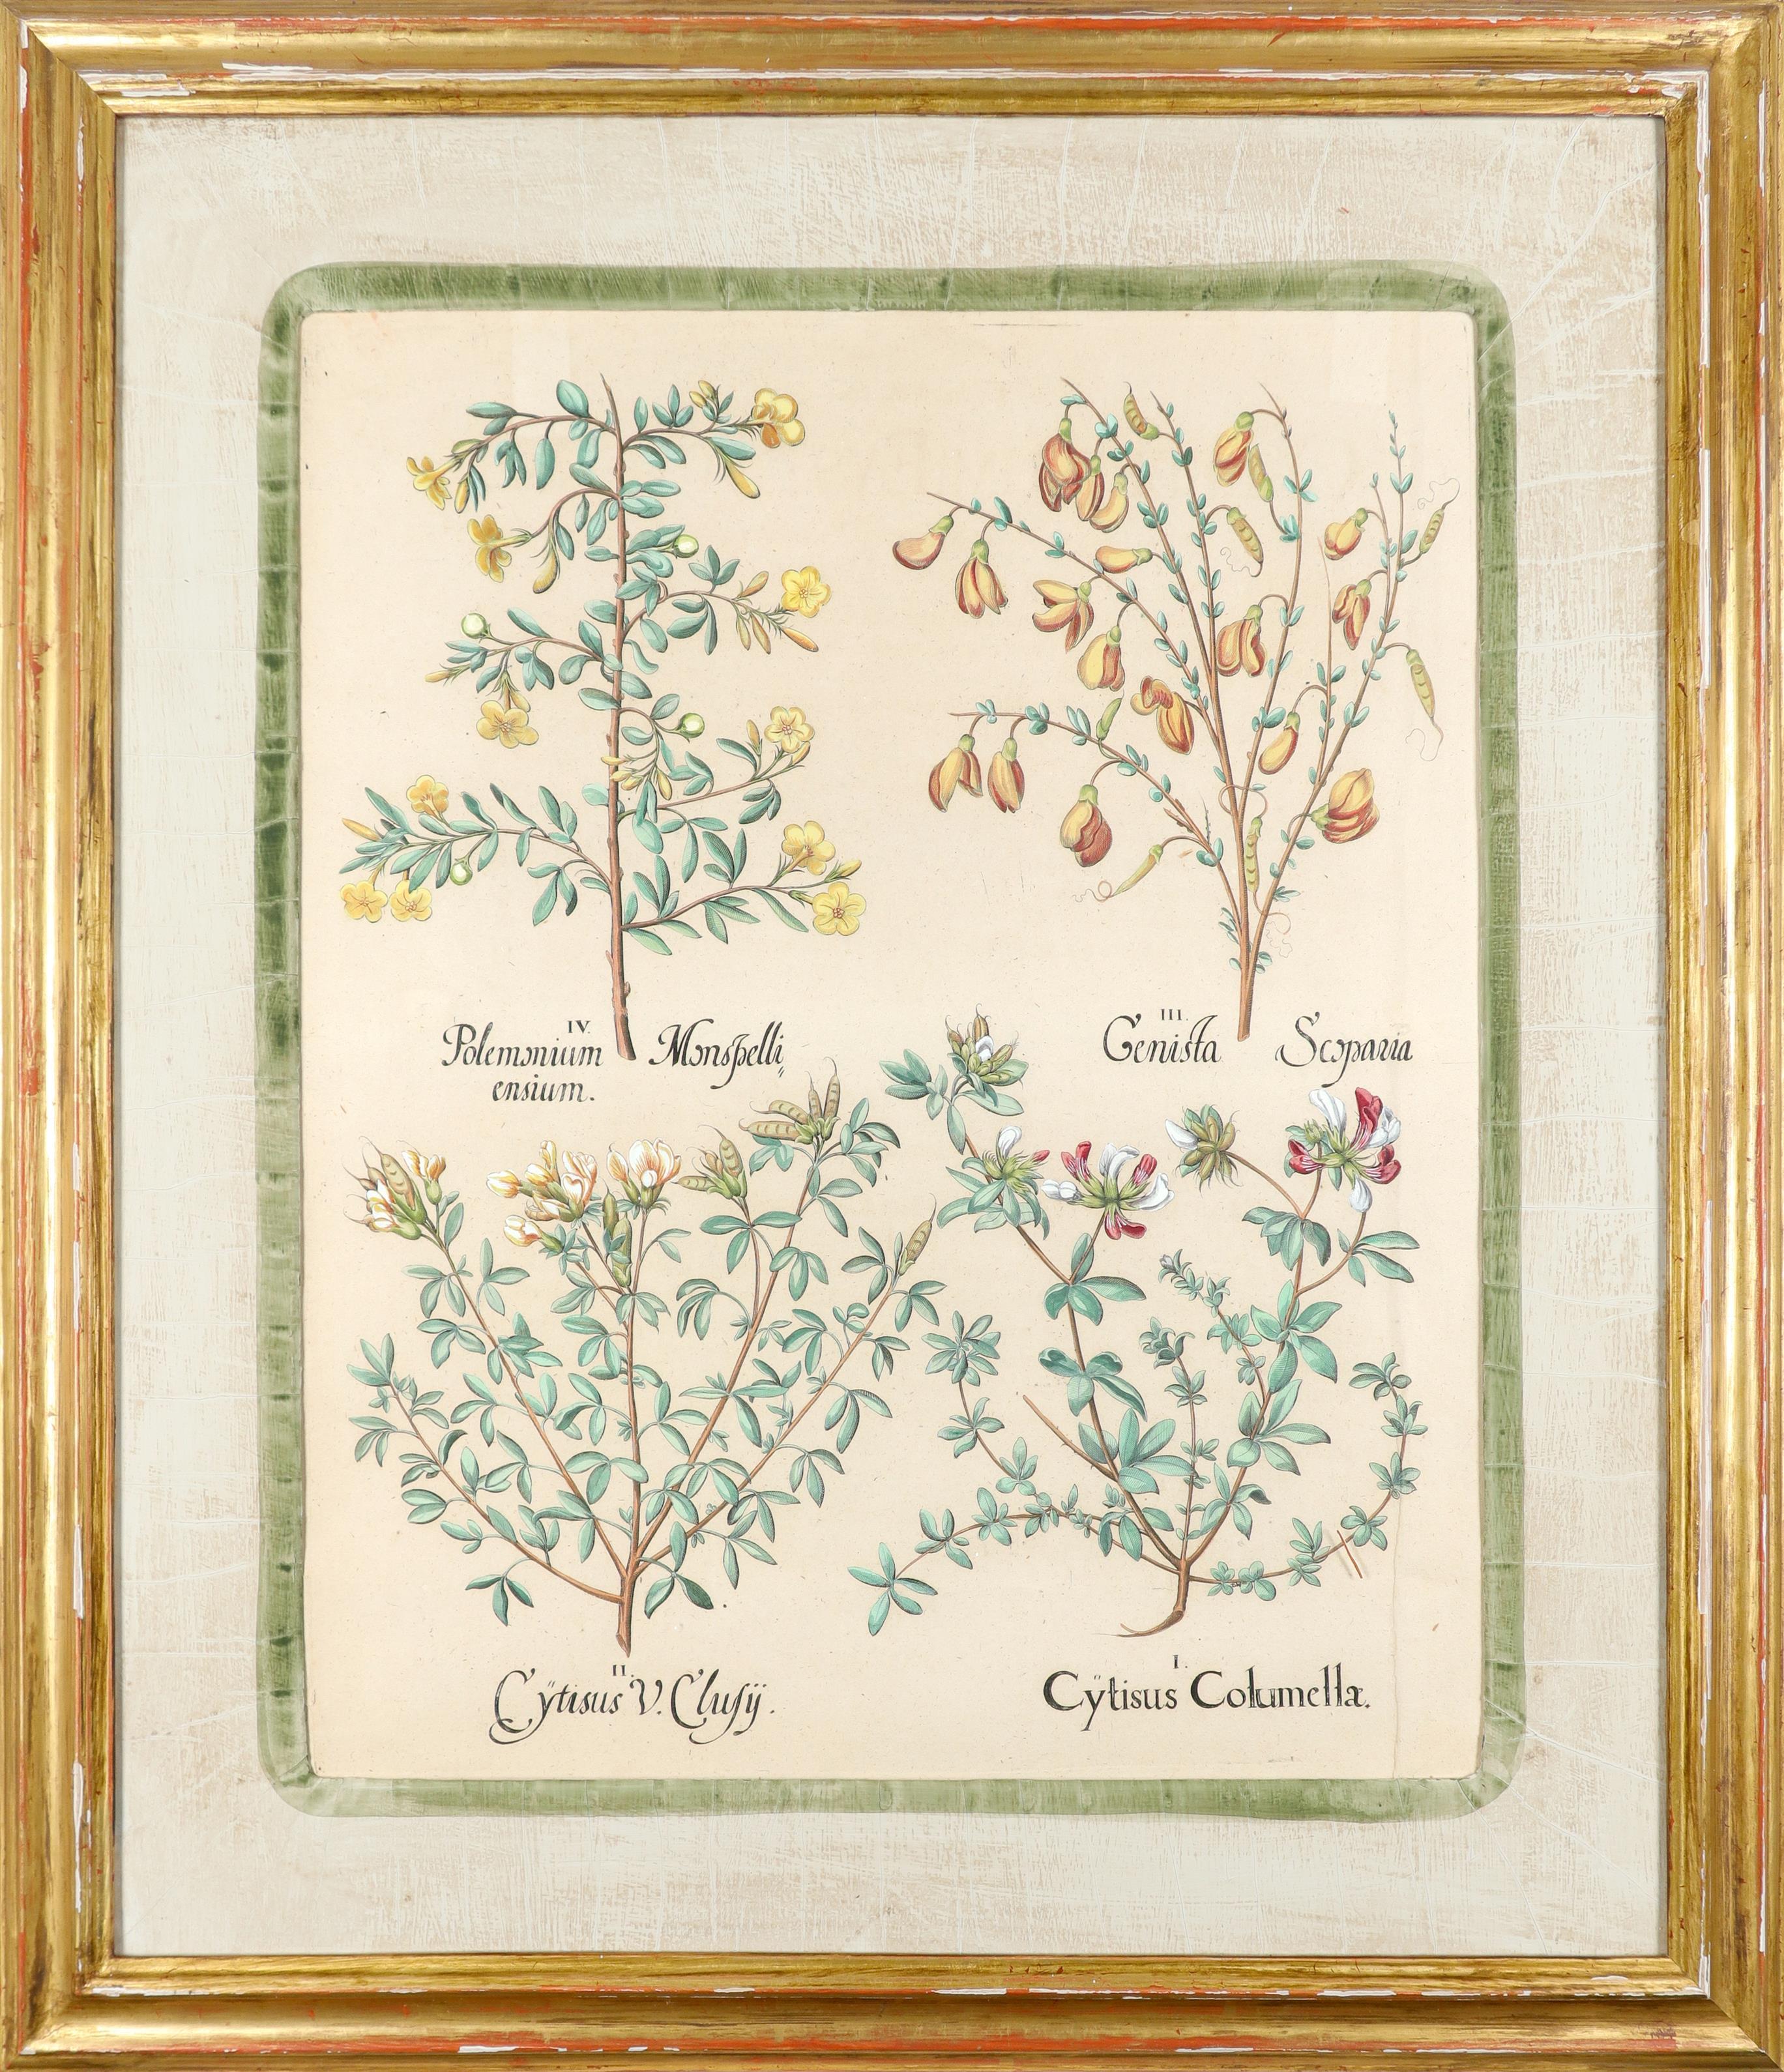 After Basilius Besler Poma flore multiplici; Aquilegia stellata flore vio laceo; Cytisus - Image 8 of 36